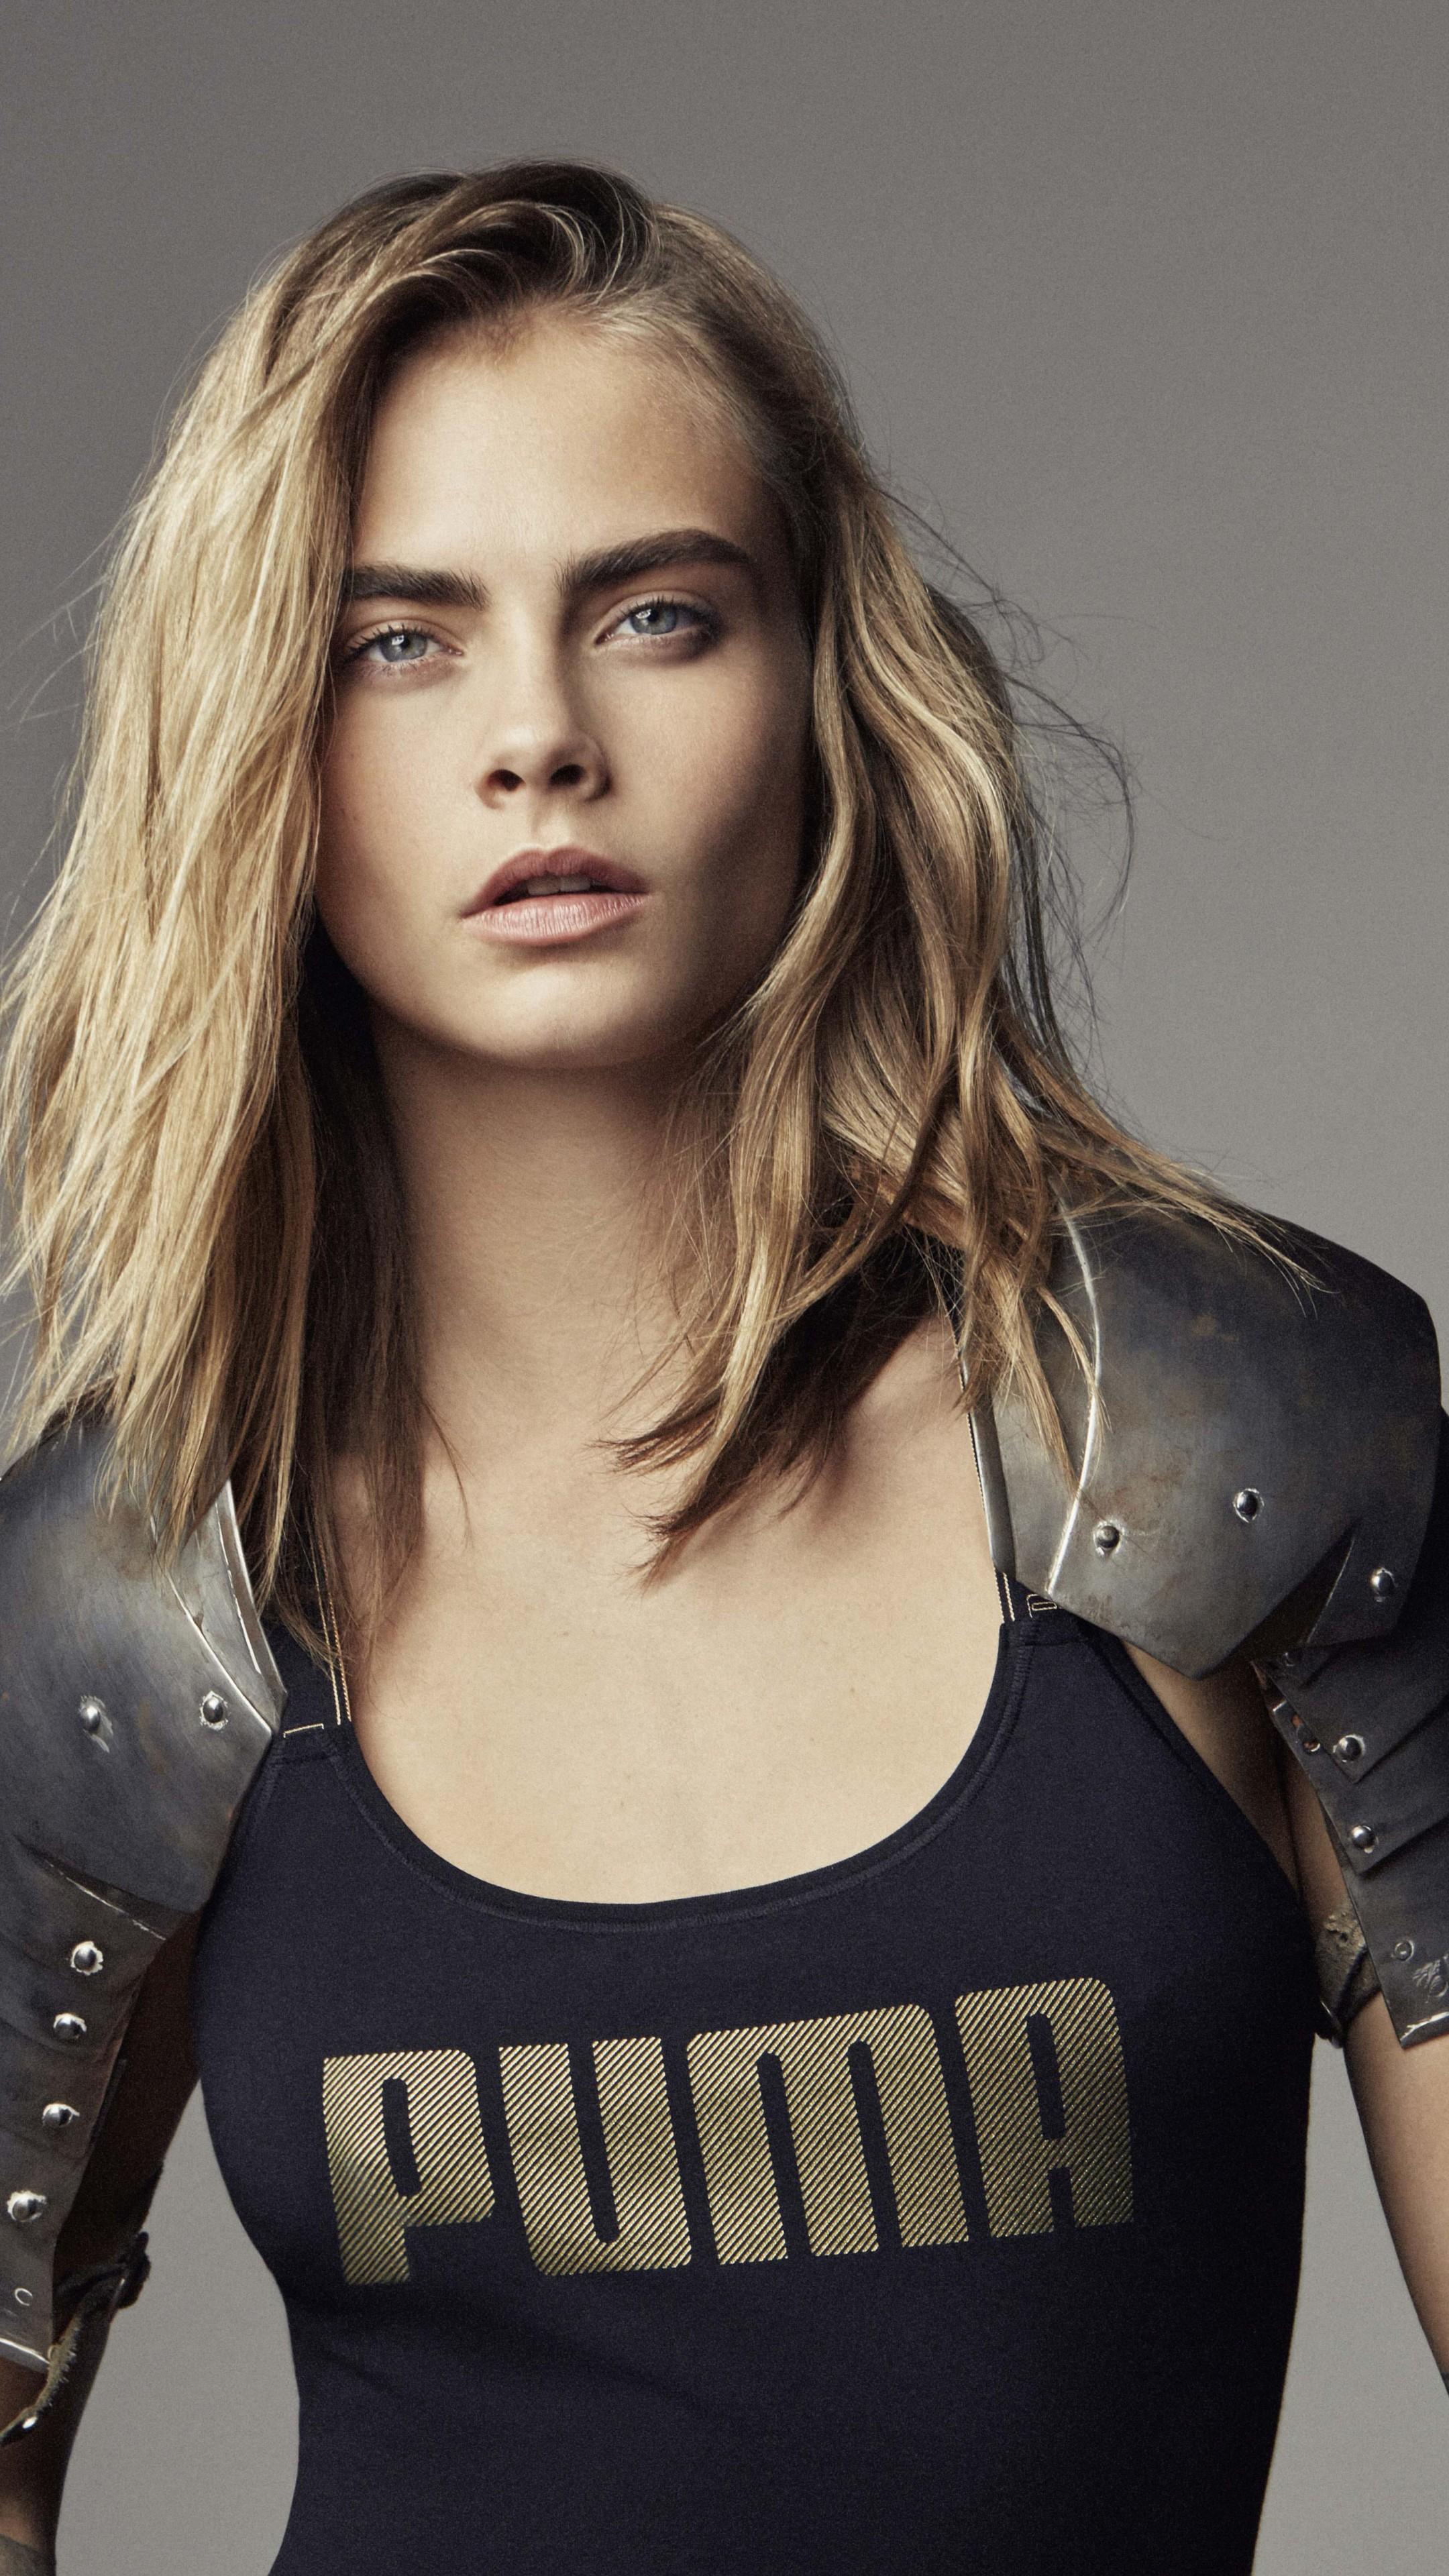 Wallpaper Cara Delevingne, Top Fashion Models, model ...